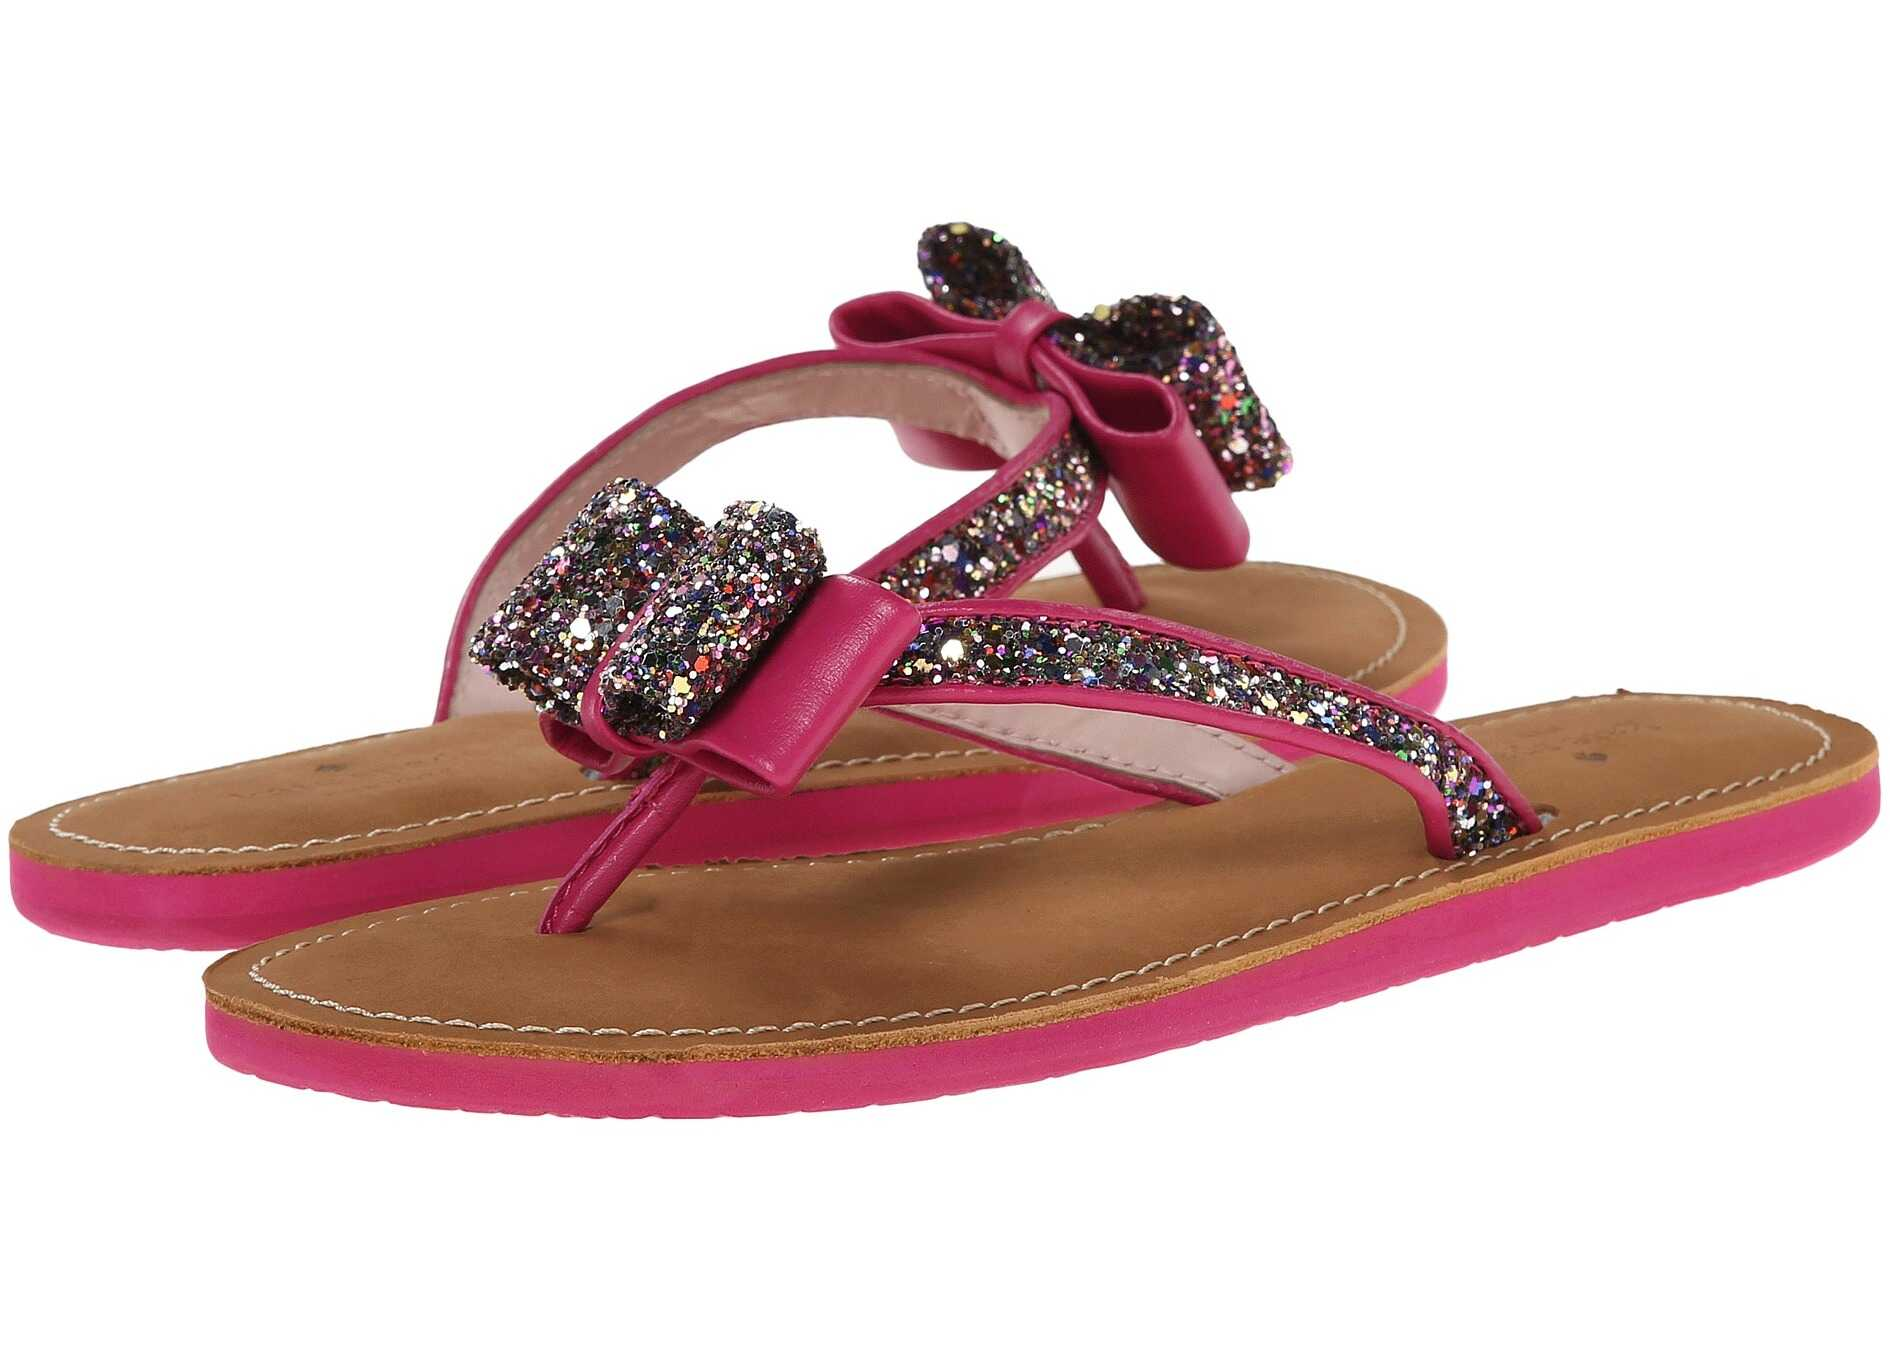 Kate Spade New York Icarda Multi Glitter/Deep Pink Nappa